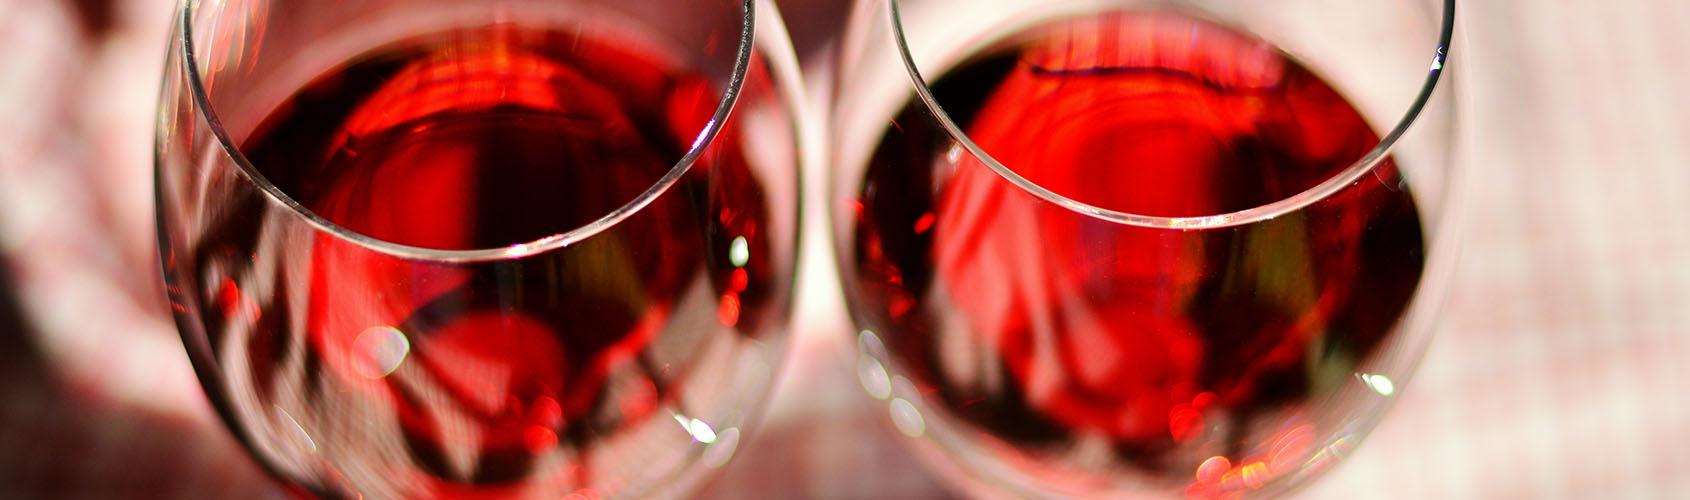 verre vin rouge kcal